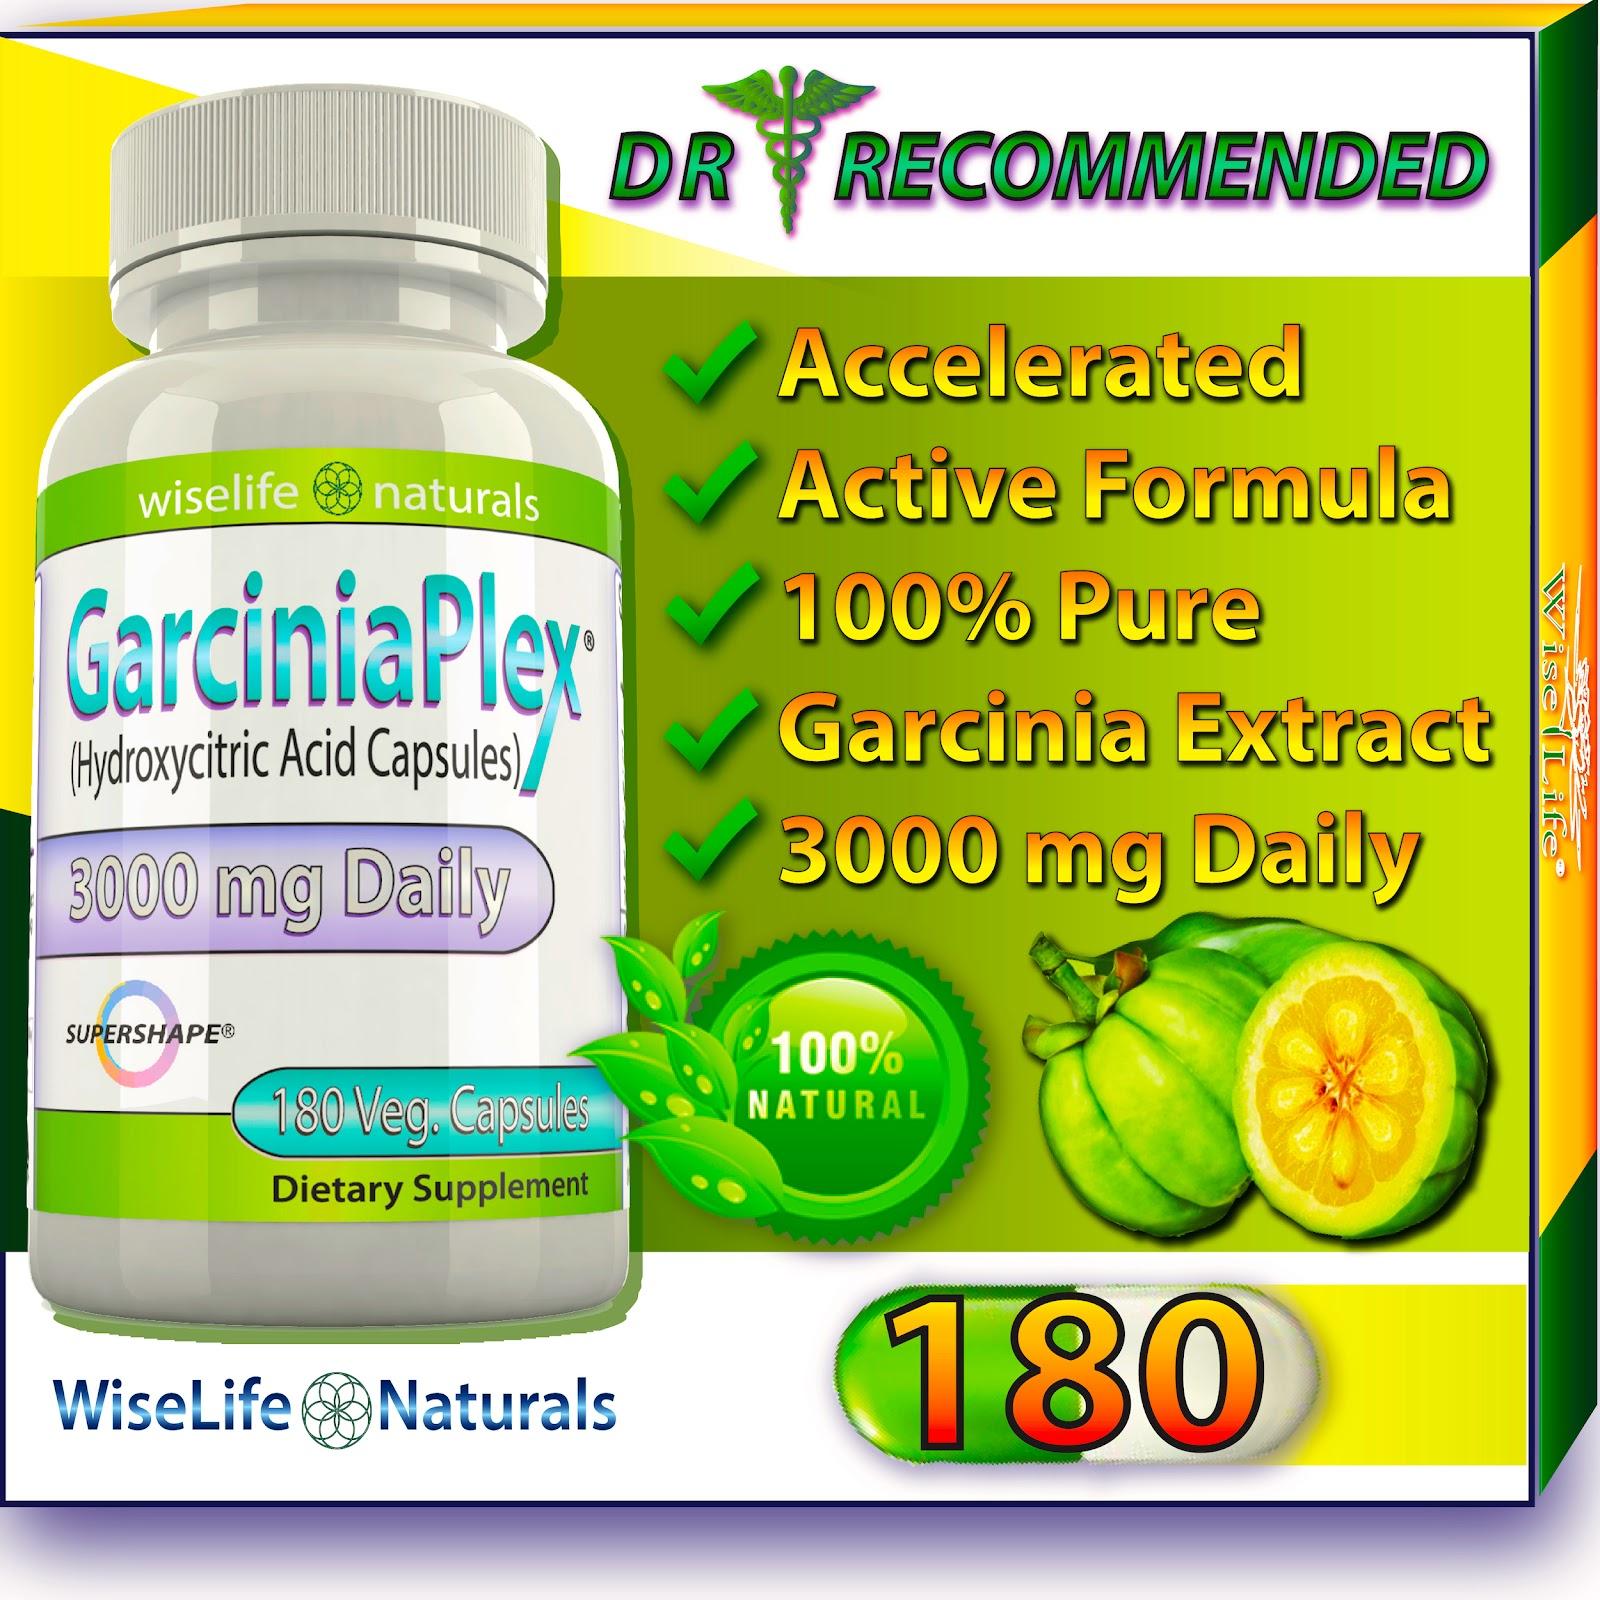 box ads wln garciniaplex-180-02.jpg